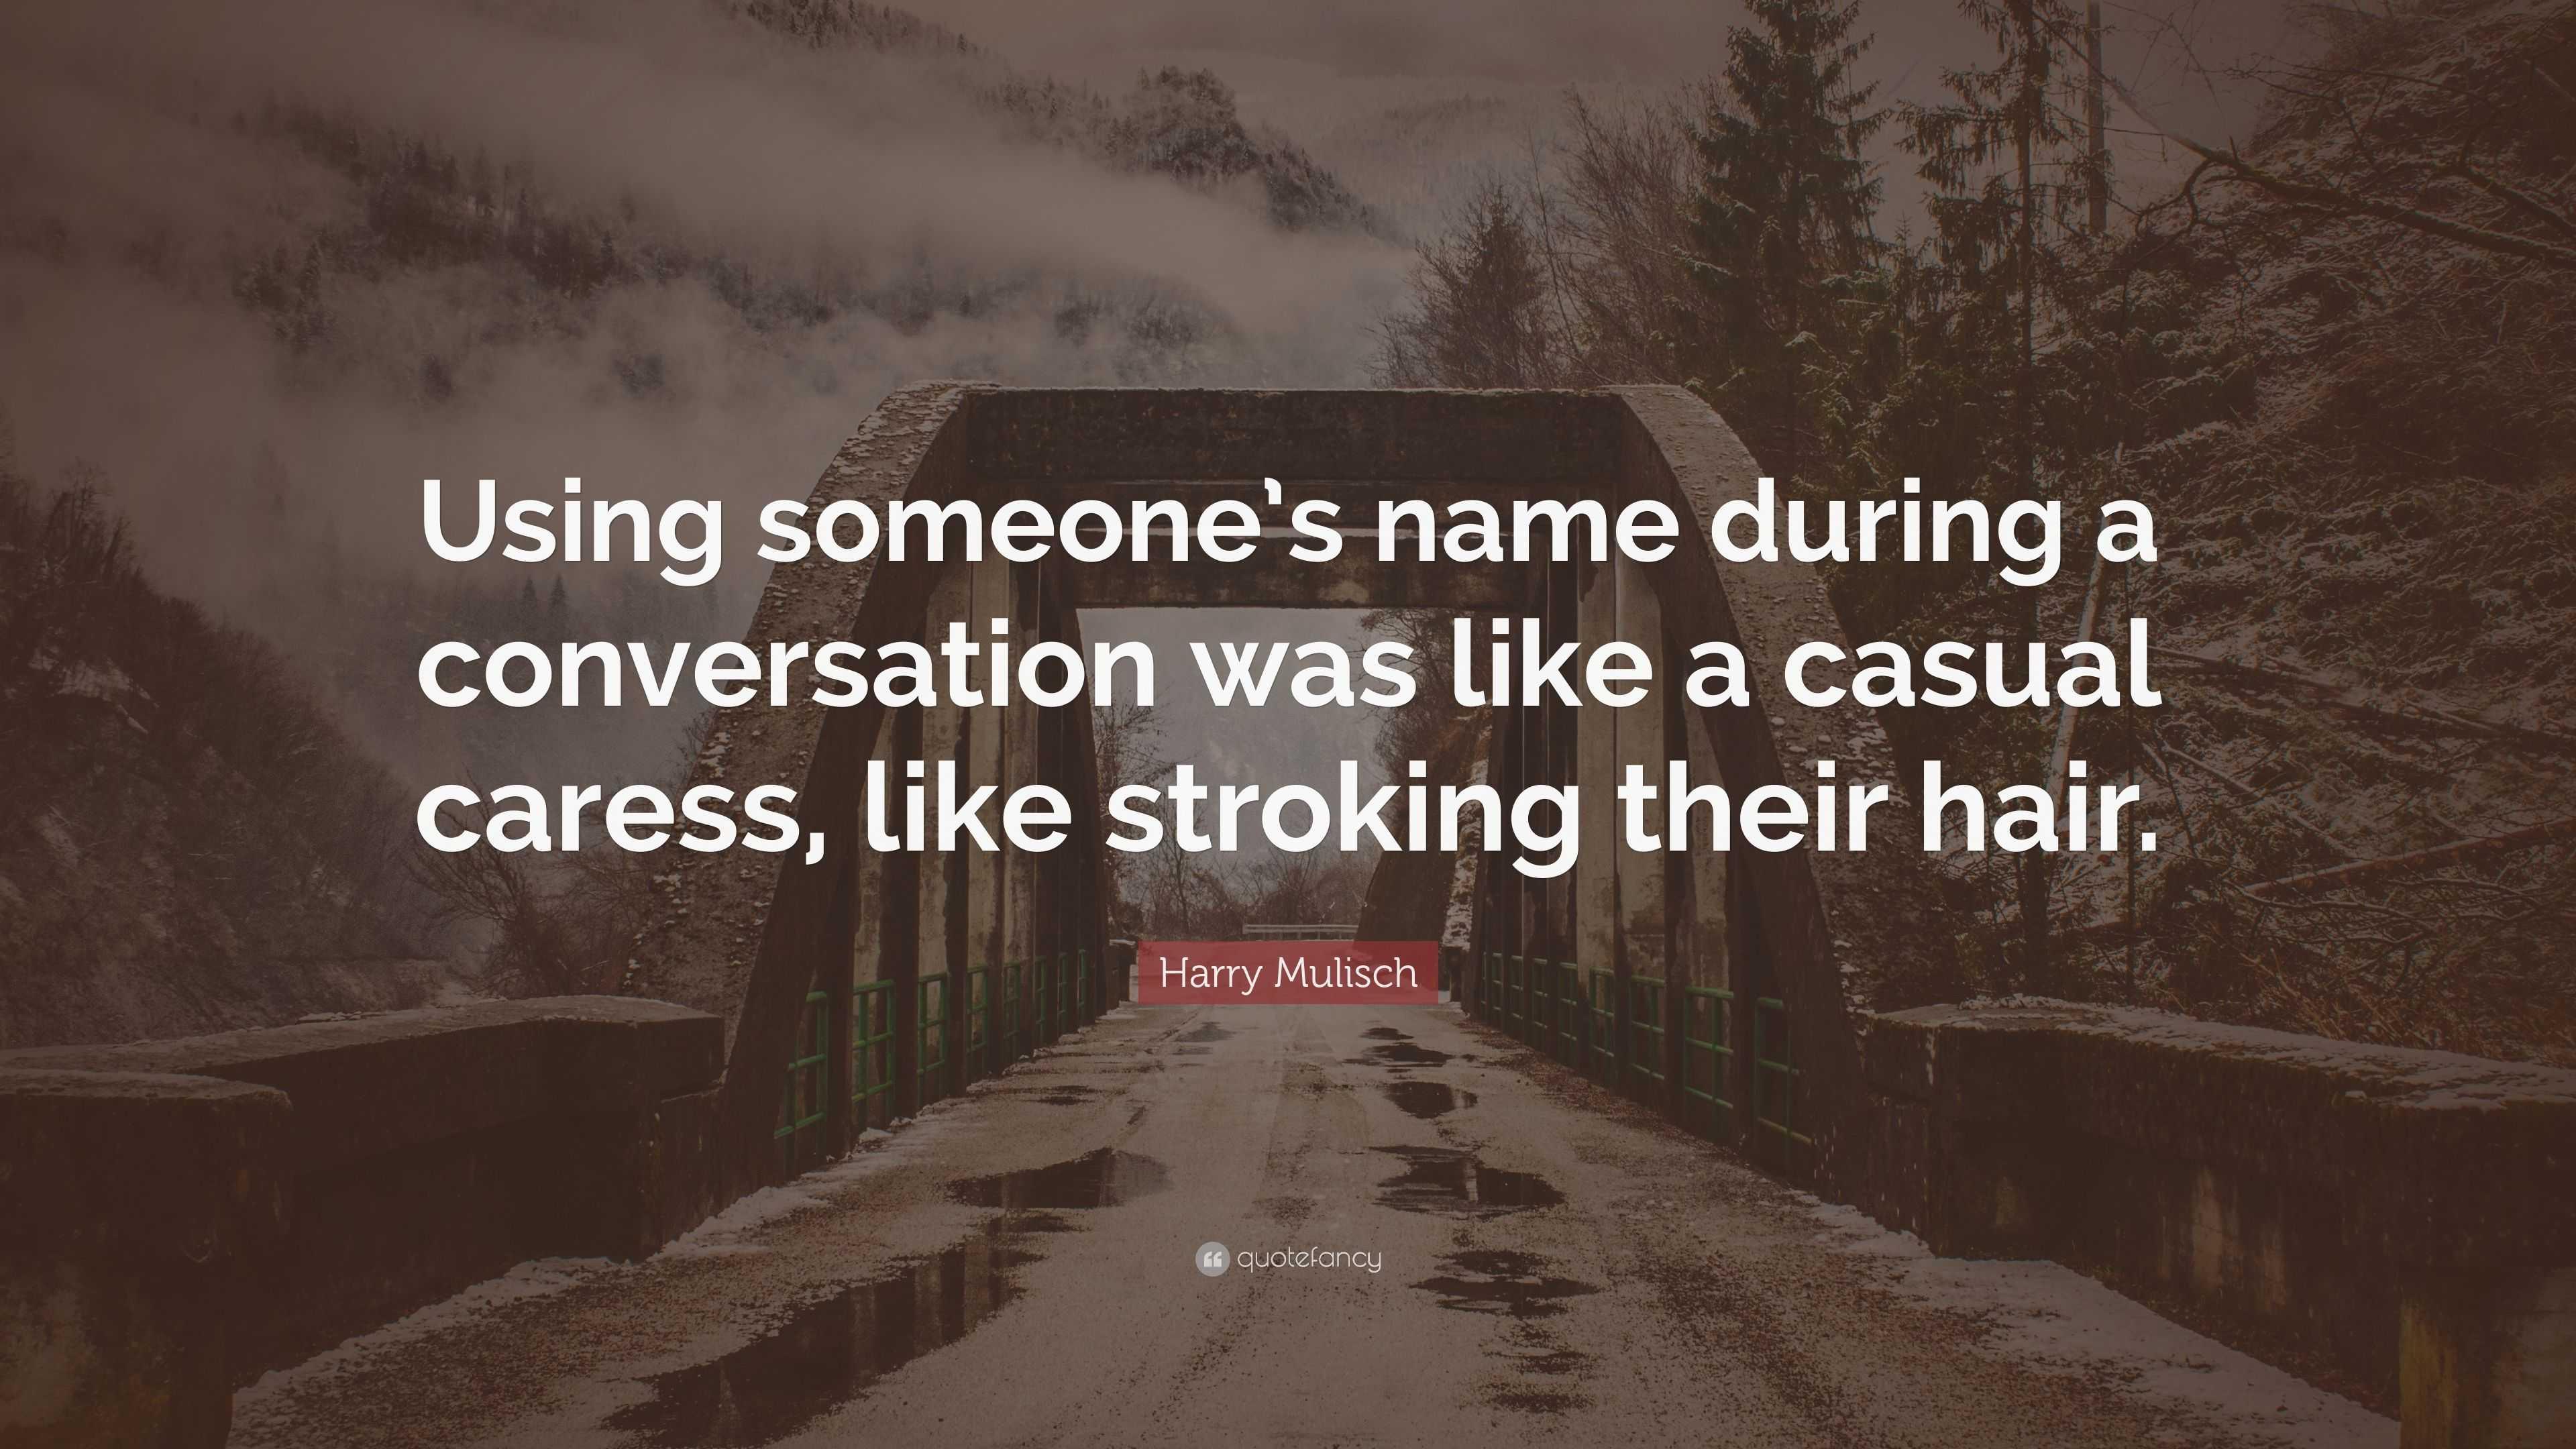 to caress someone